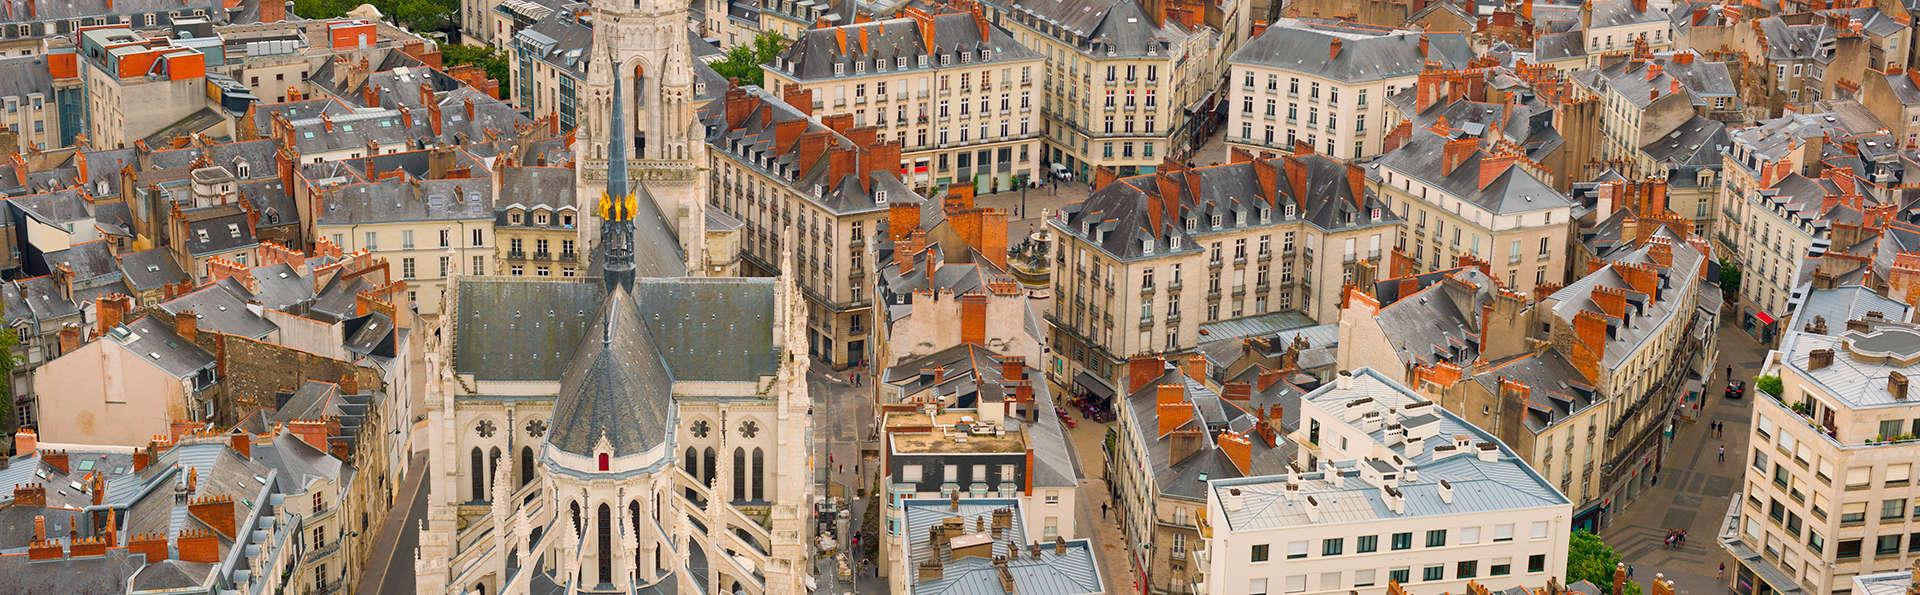 Best Western Plus Hôtel de la Regate - EDIT_nantes1.jpg